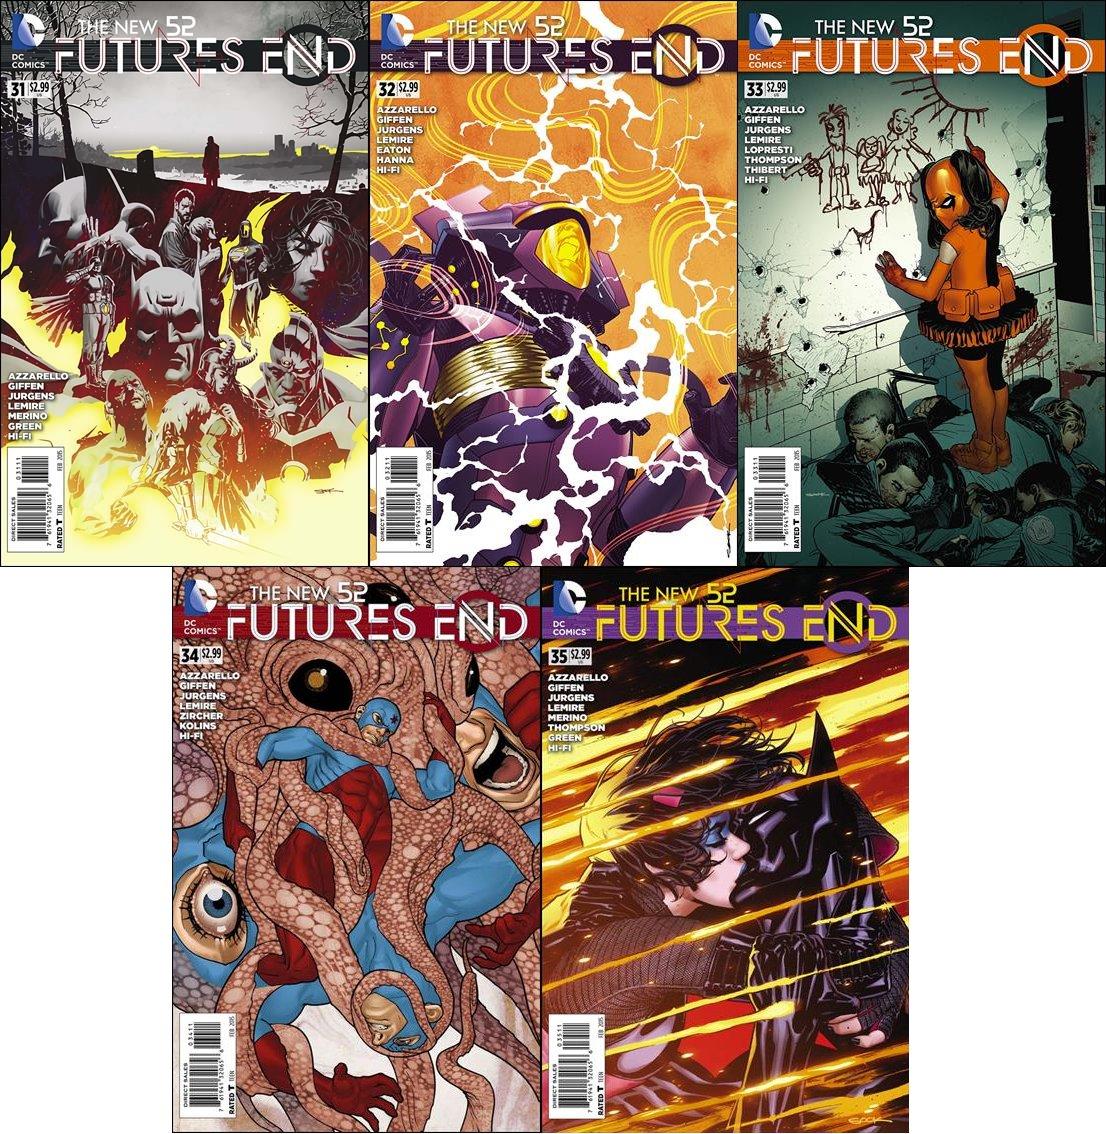 New 52 Future's End Trade Set #31 32 33 34 35 [2014] VF/NM DC Comics